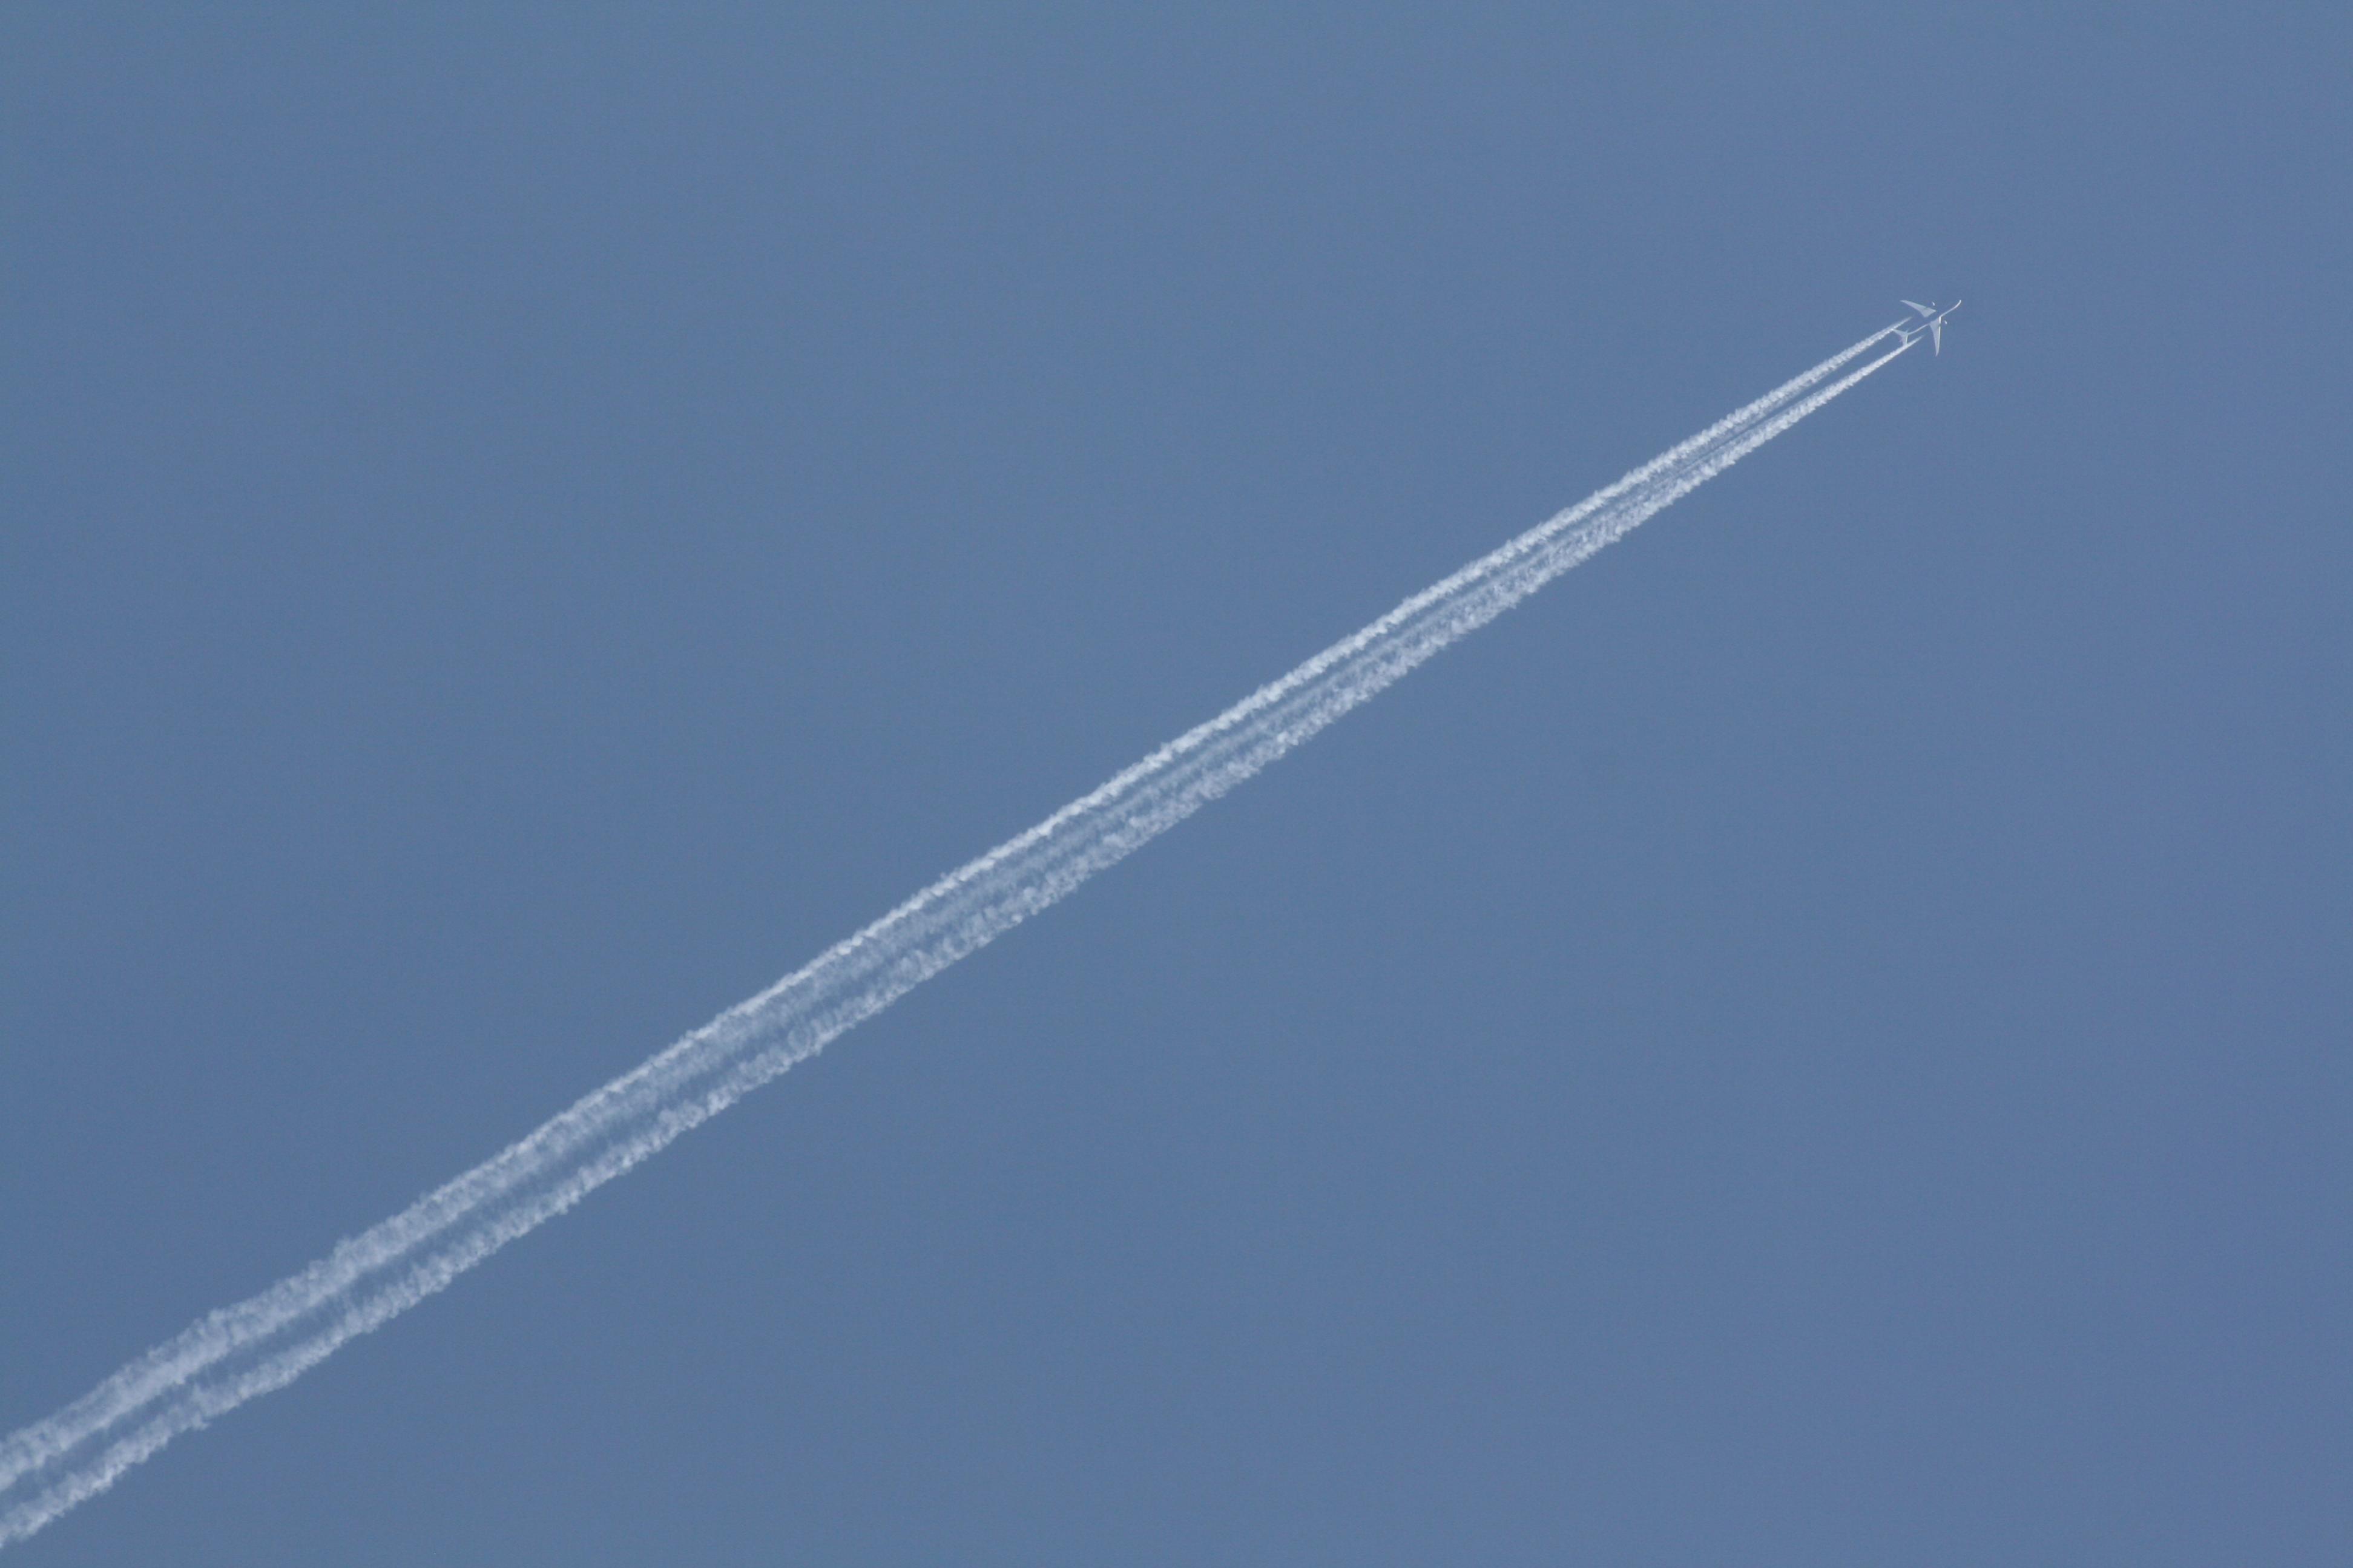 Naam: Boeing backgarden.jpg Bekeken: 341 Grootte: 391,7 KB